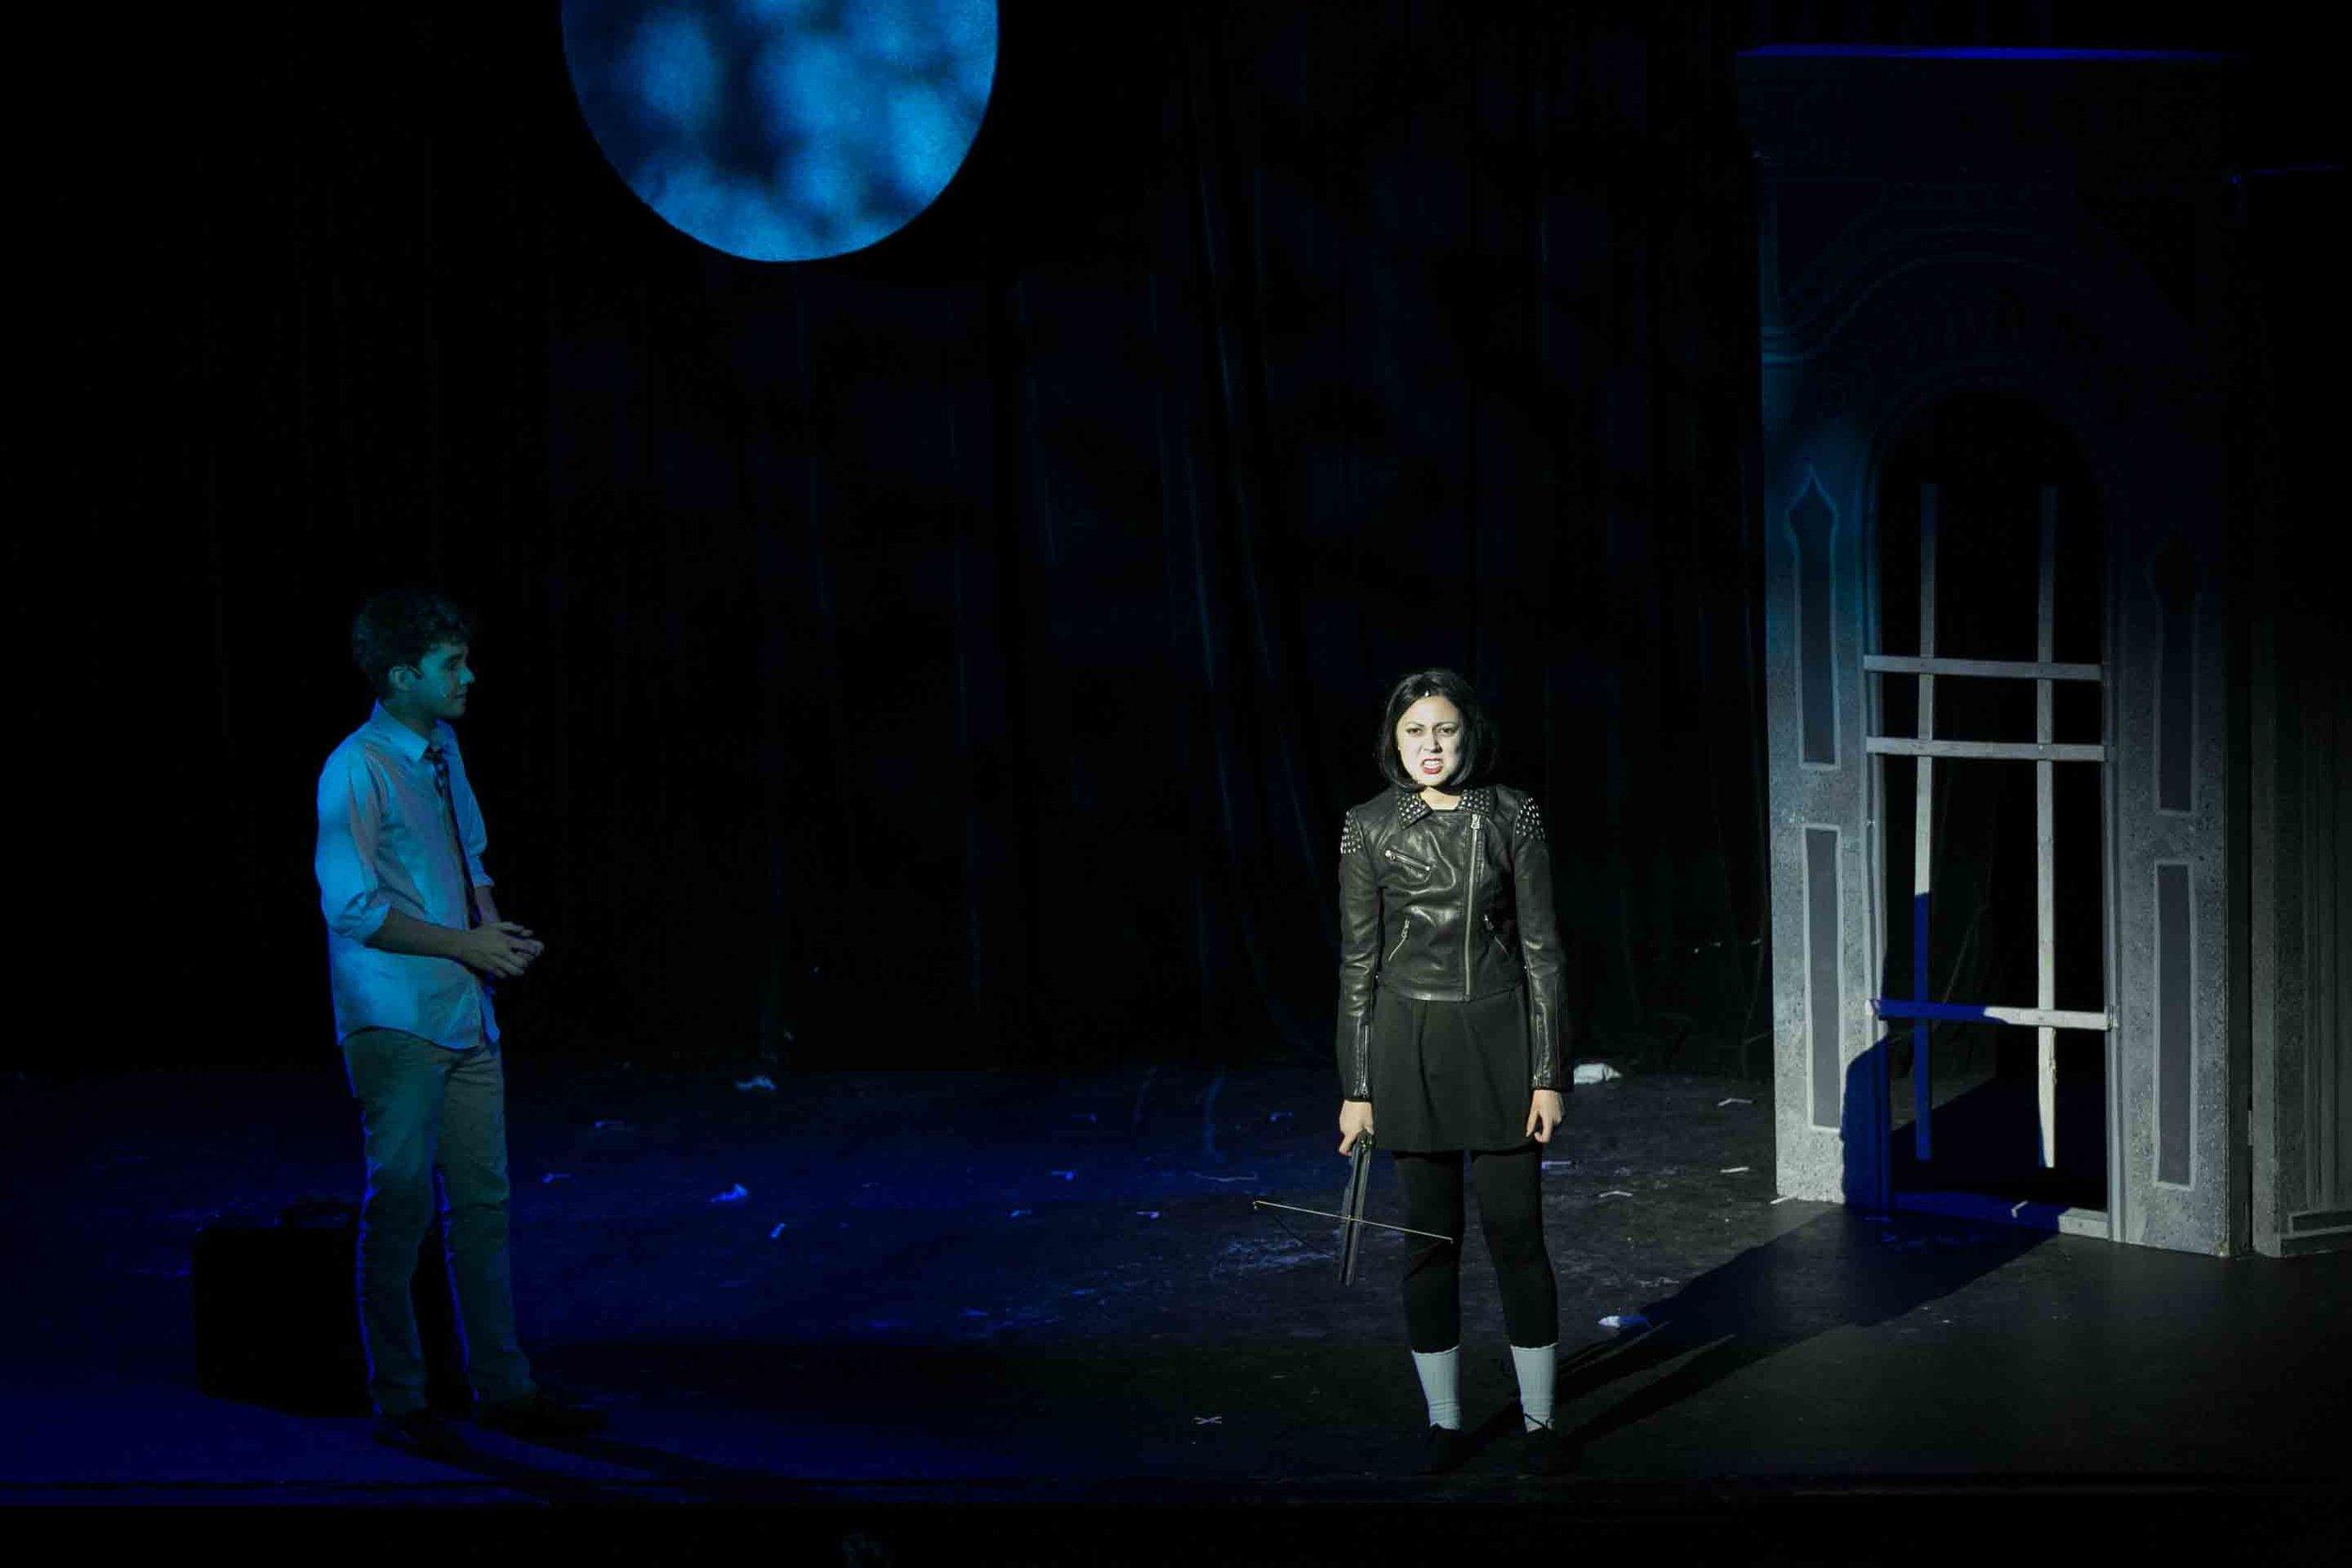 6-19-16 Addams Family Creepy Cast 0251.jpg